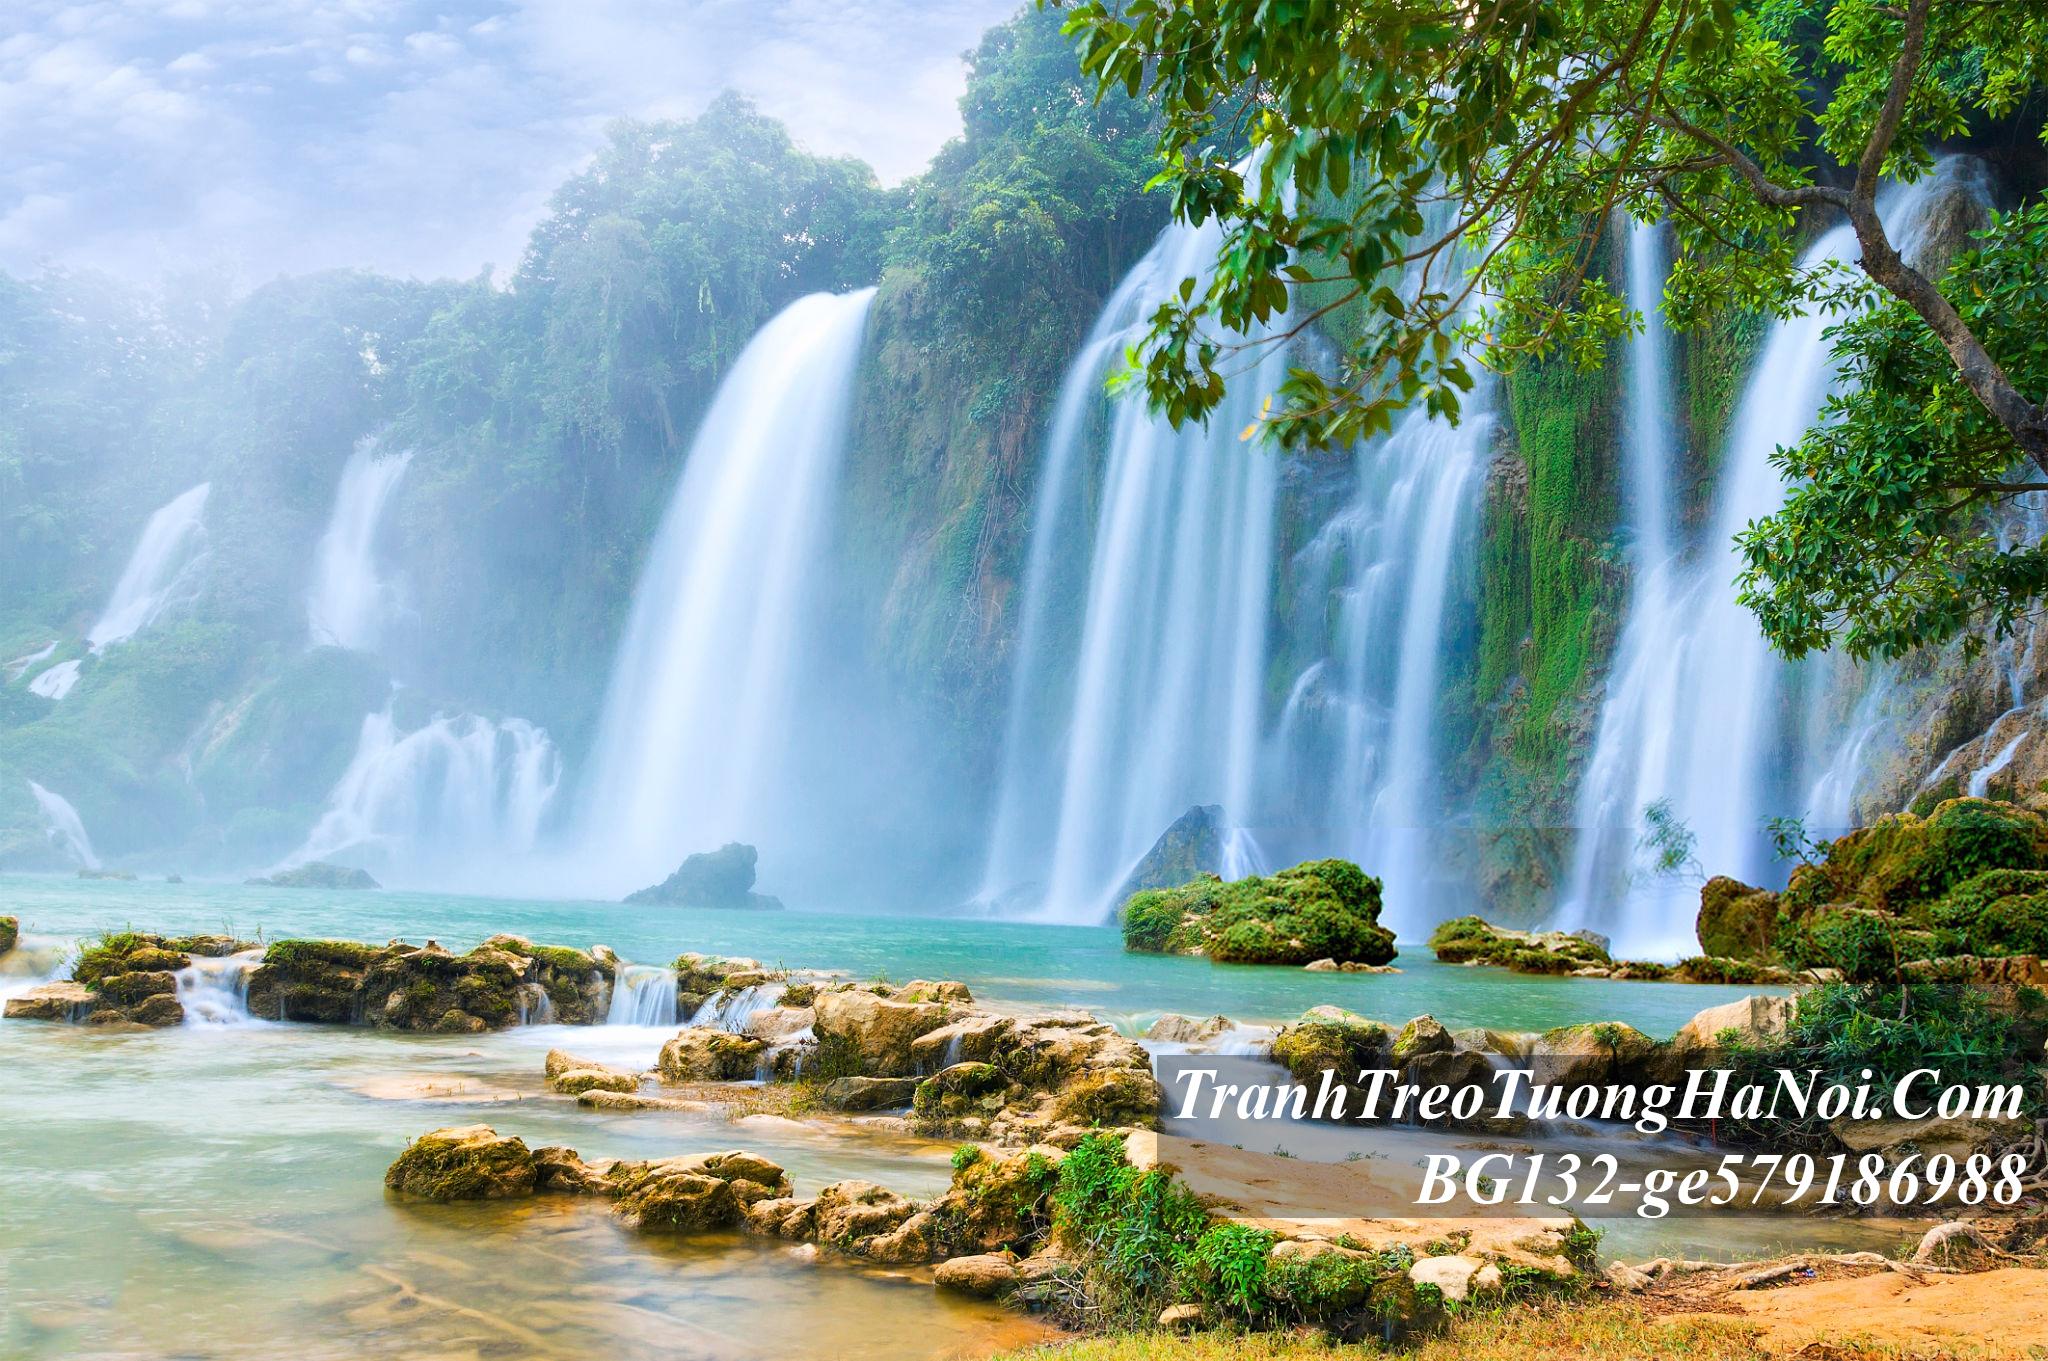 Phong canh dep thac nuoc ban gioc amia BG132-ge579186988